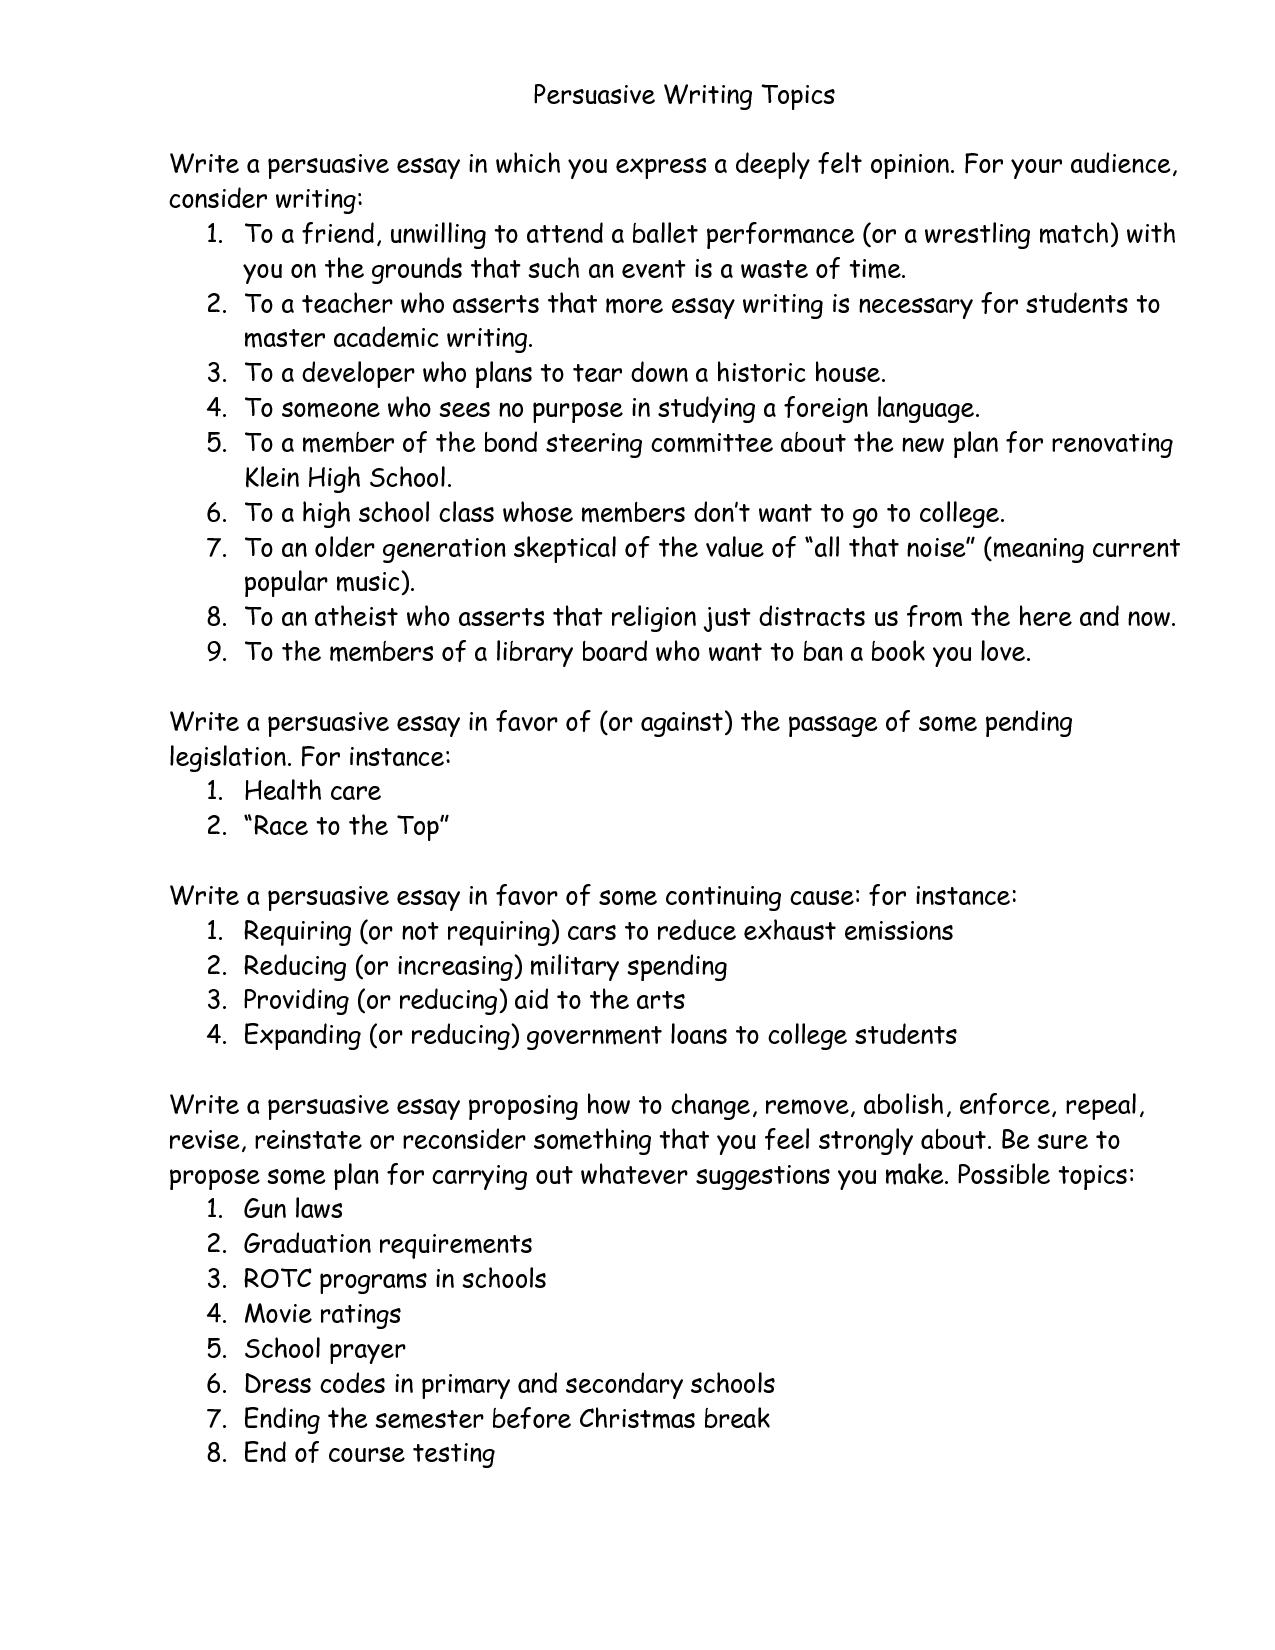 003 Essay Example Mfrv3azzsf Good Persuasive Amazing Topics 2018 Uk Argumentative High School Full